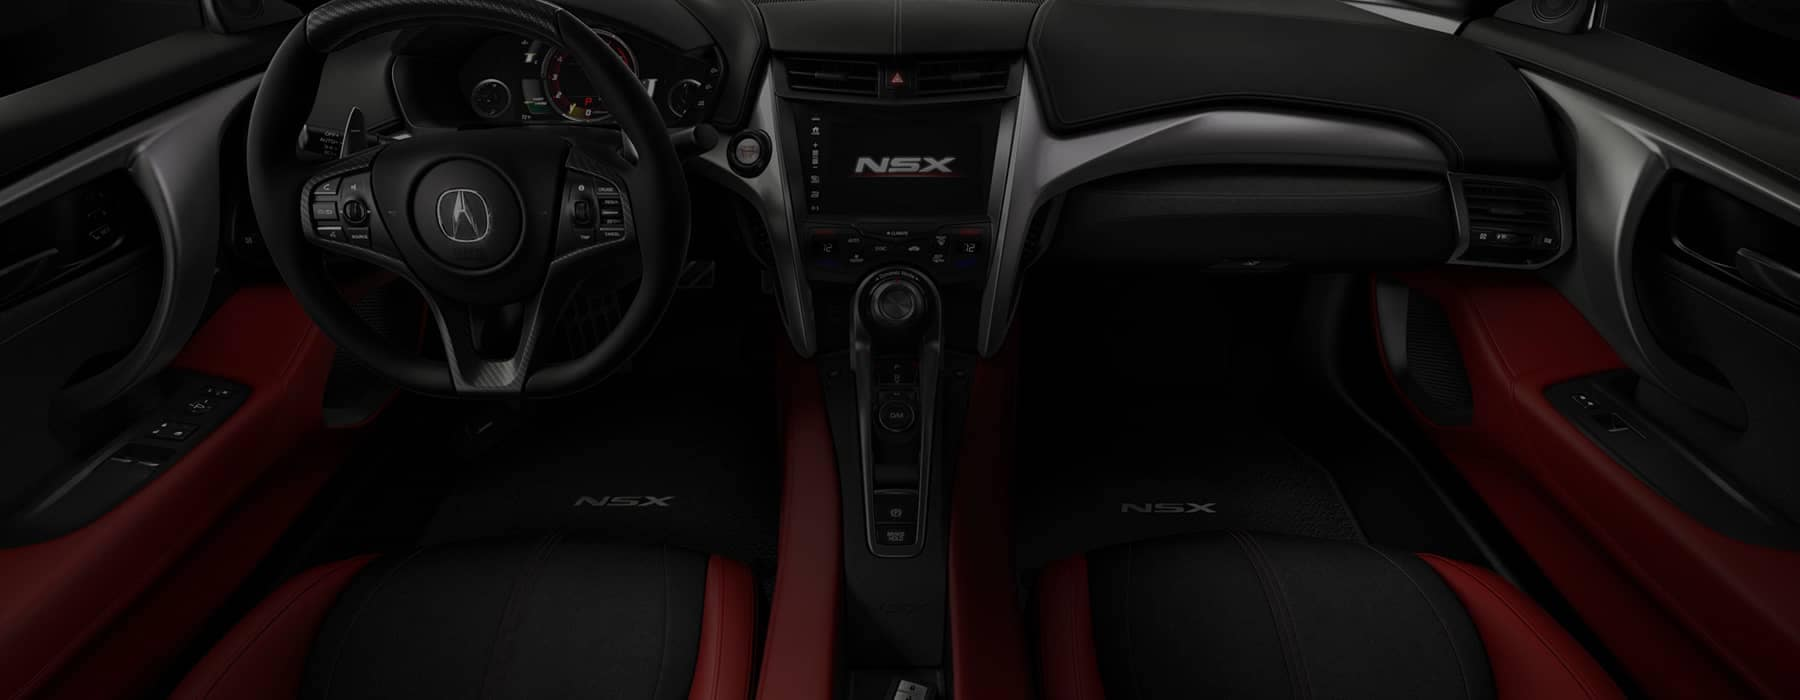 2018 Acura NSX Cabin